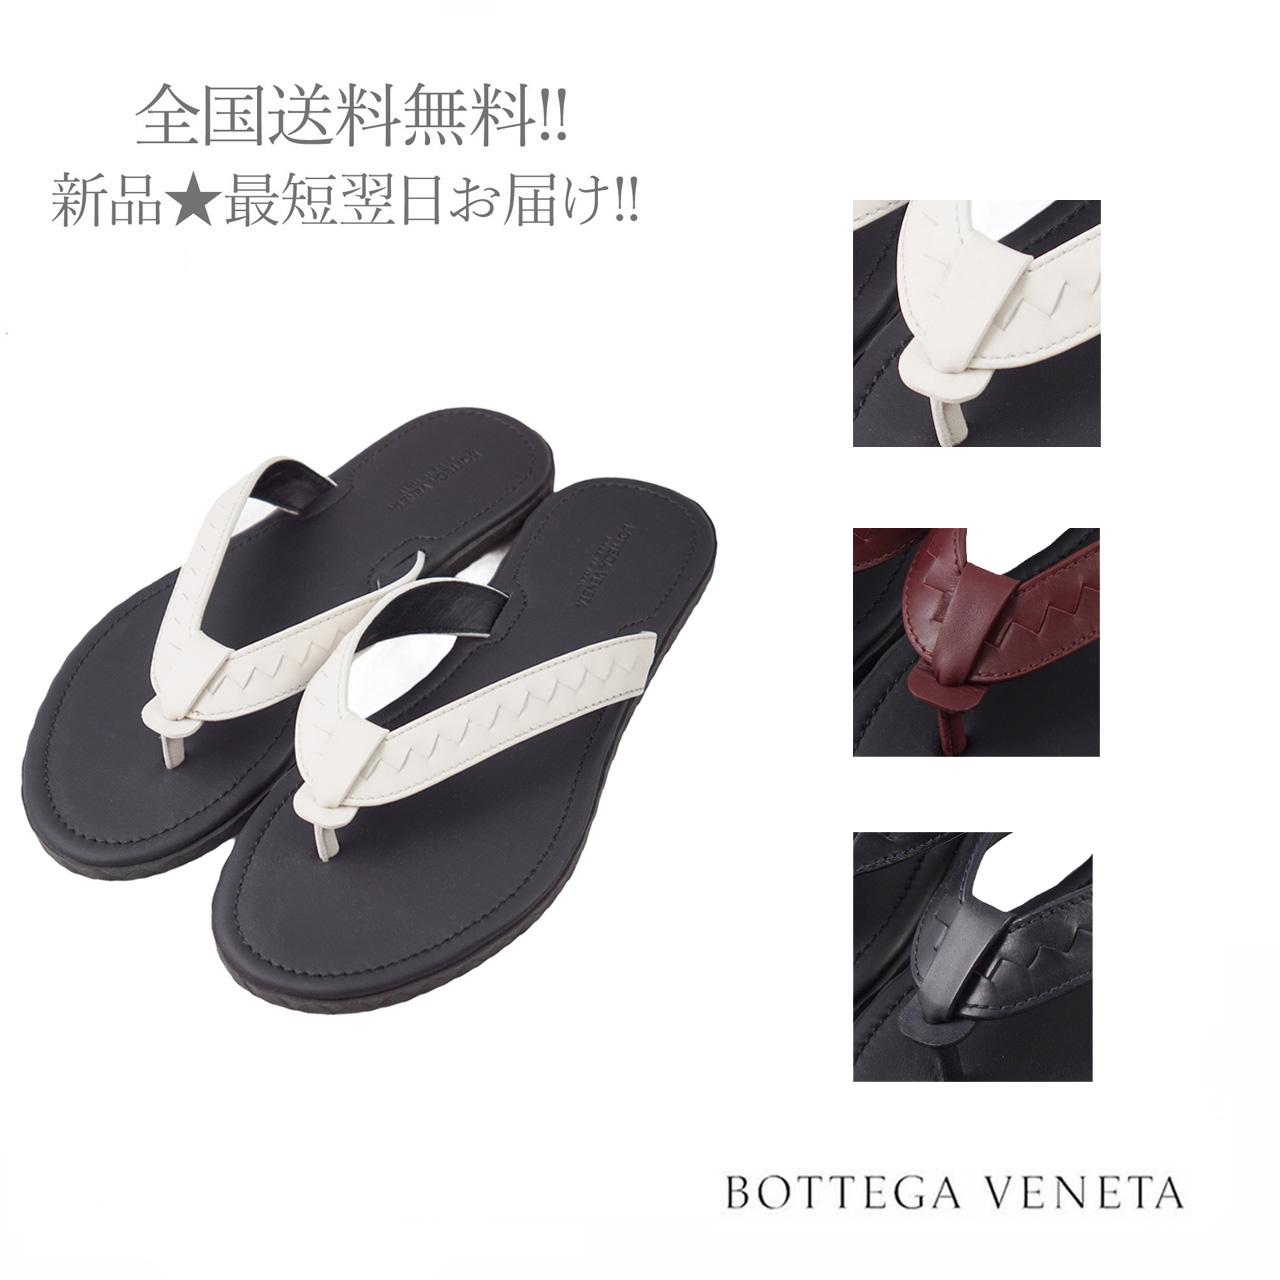 BOTTEGA VENETA ボッテガヴェネタ イタリア製 レザー サンダル メンズ イントレ 送料無料/新品 格安店 新品 男